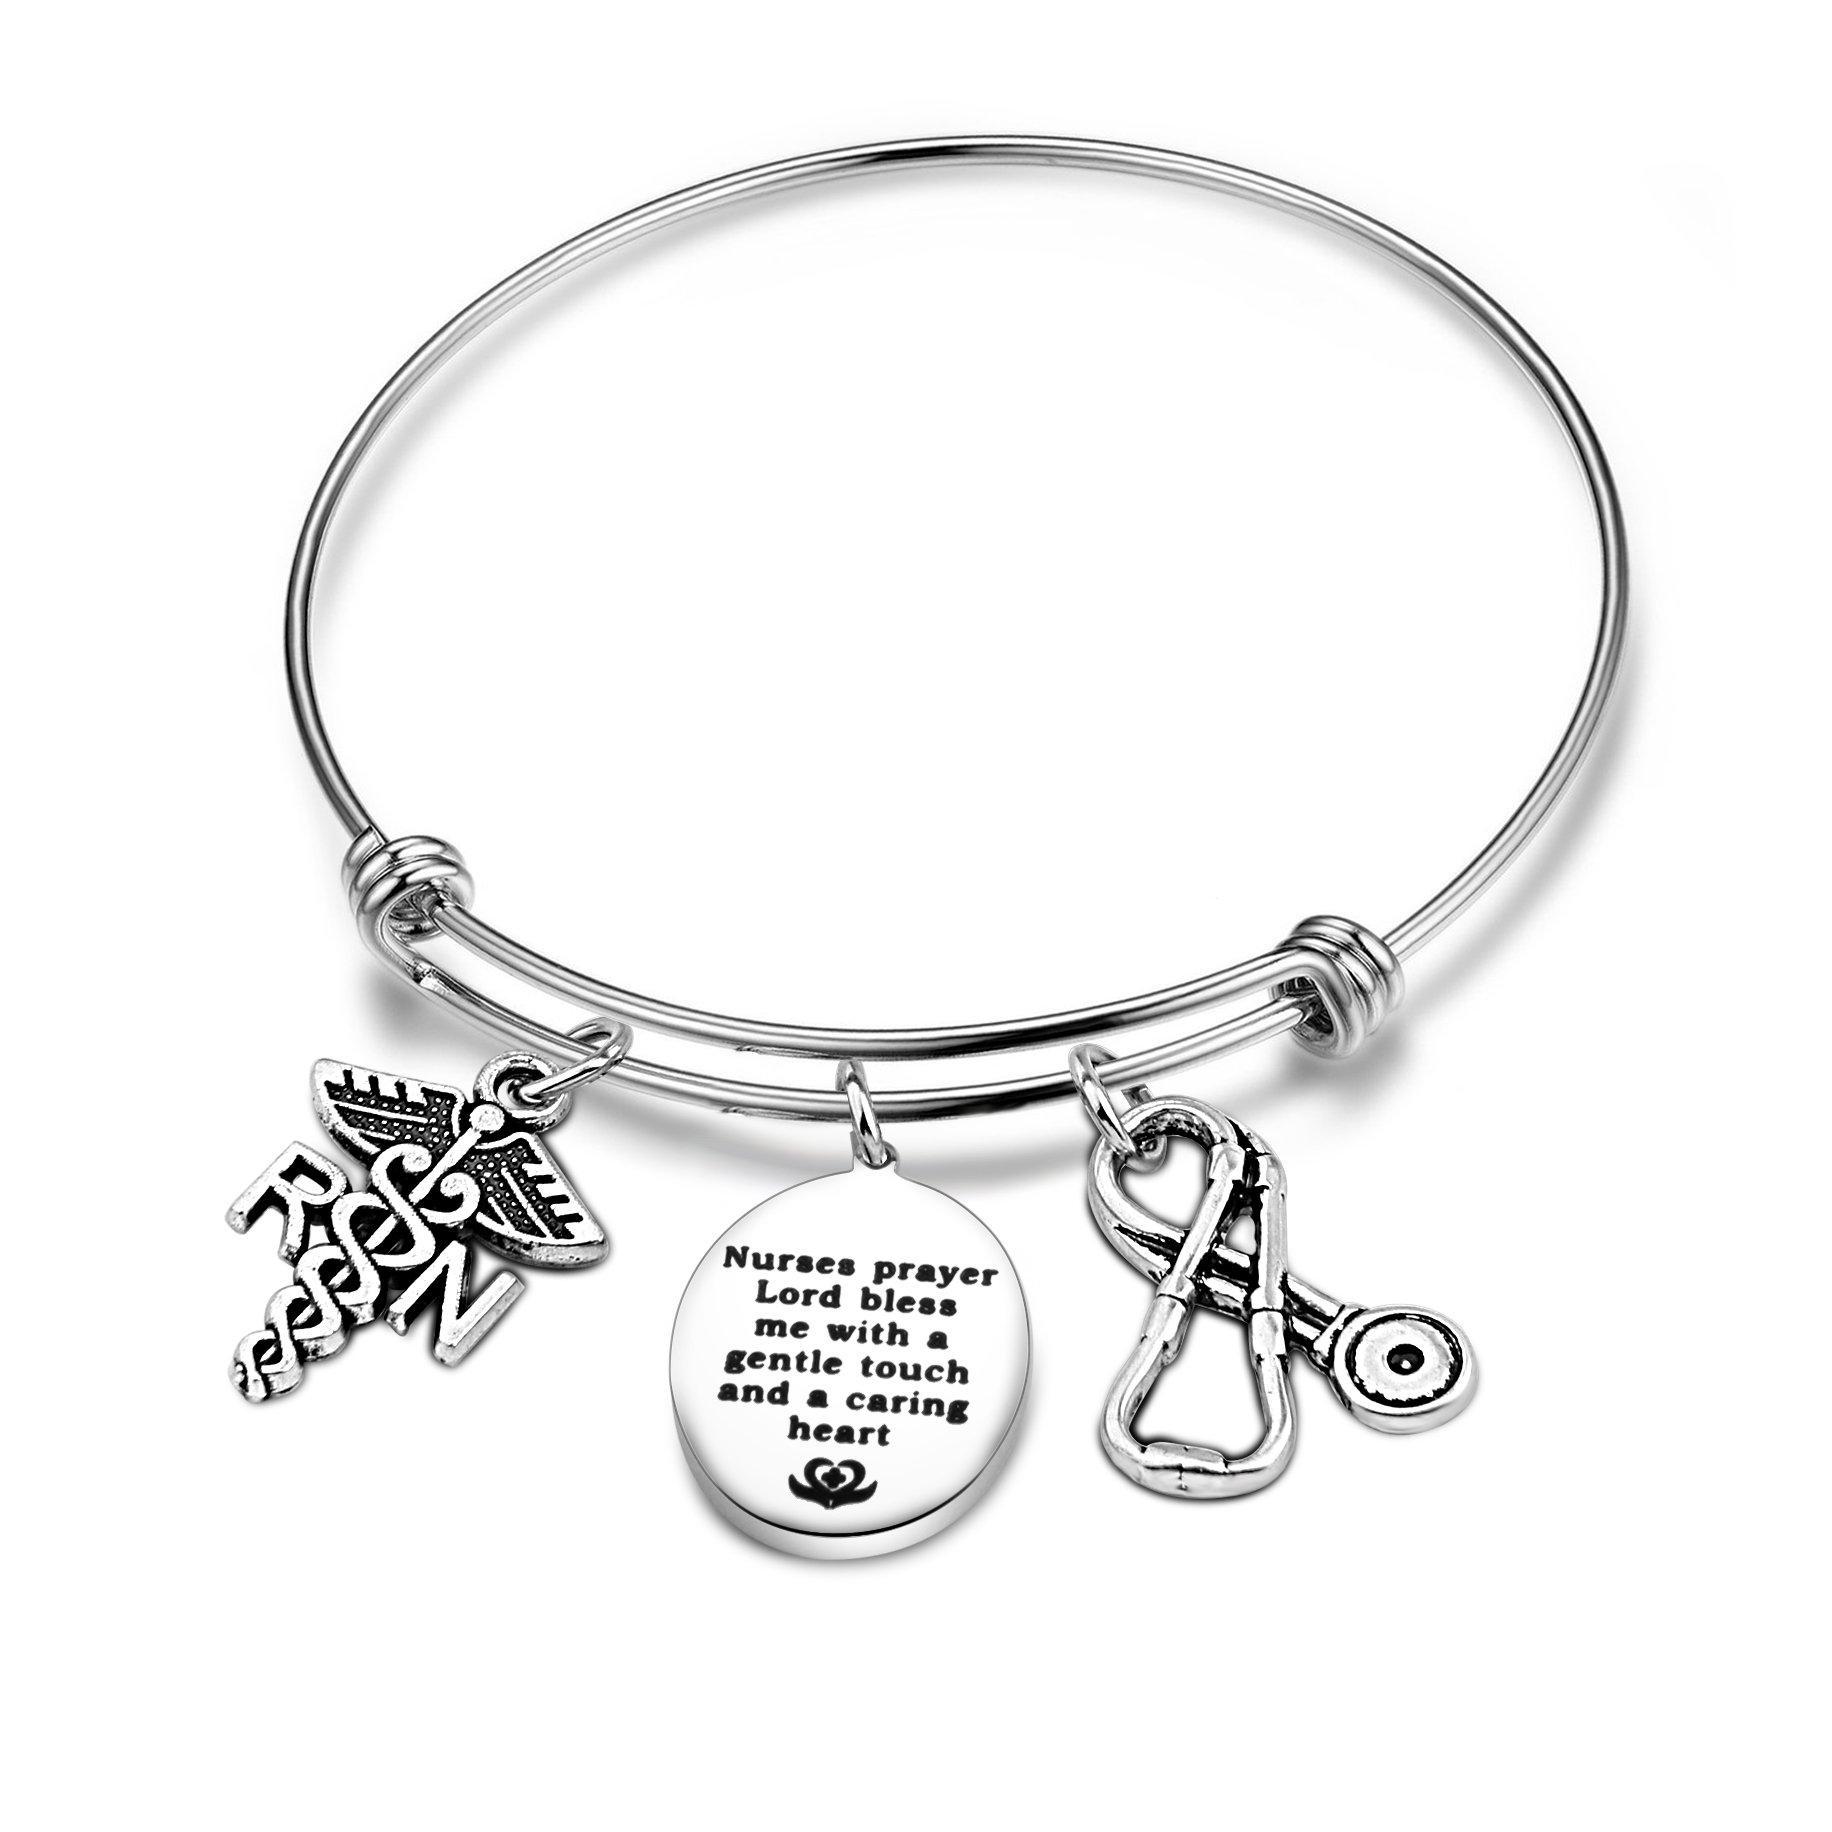 SEIRAA Nurse Prayer Bracelet With RN Stethoscope Caduceus Charms Nurse Prayer Jewelry Gift for Nurse Doctor (Nurse Prayer Bracelet)